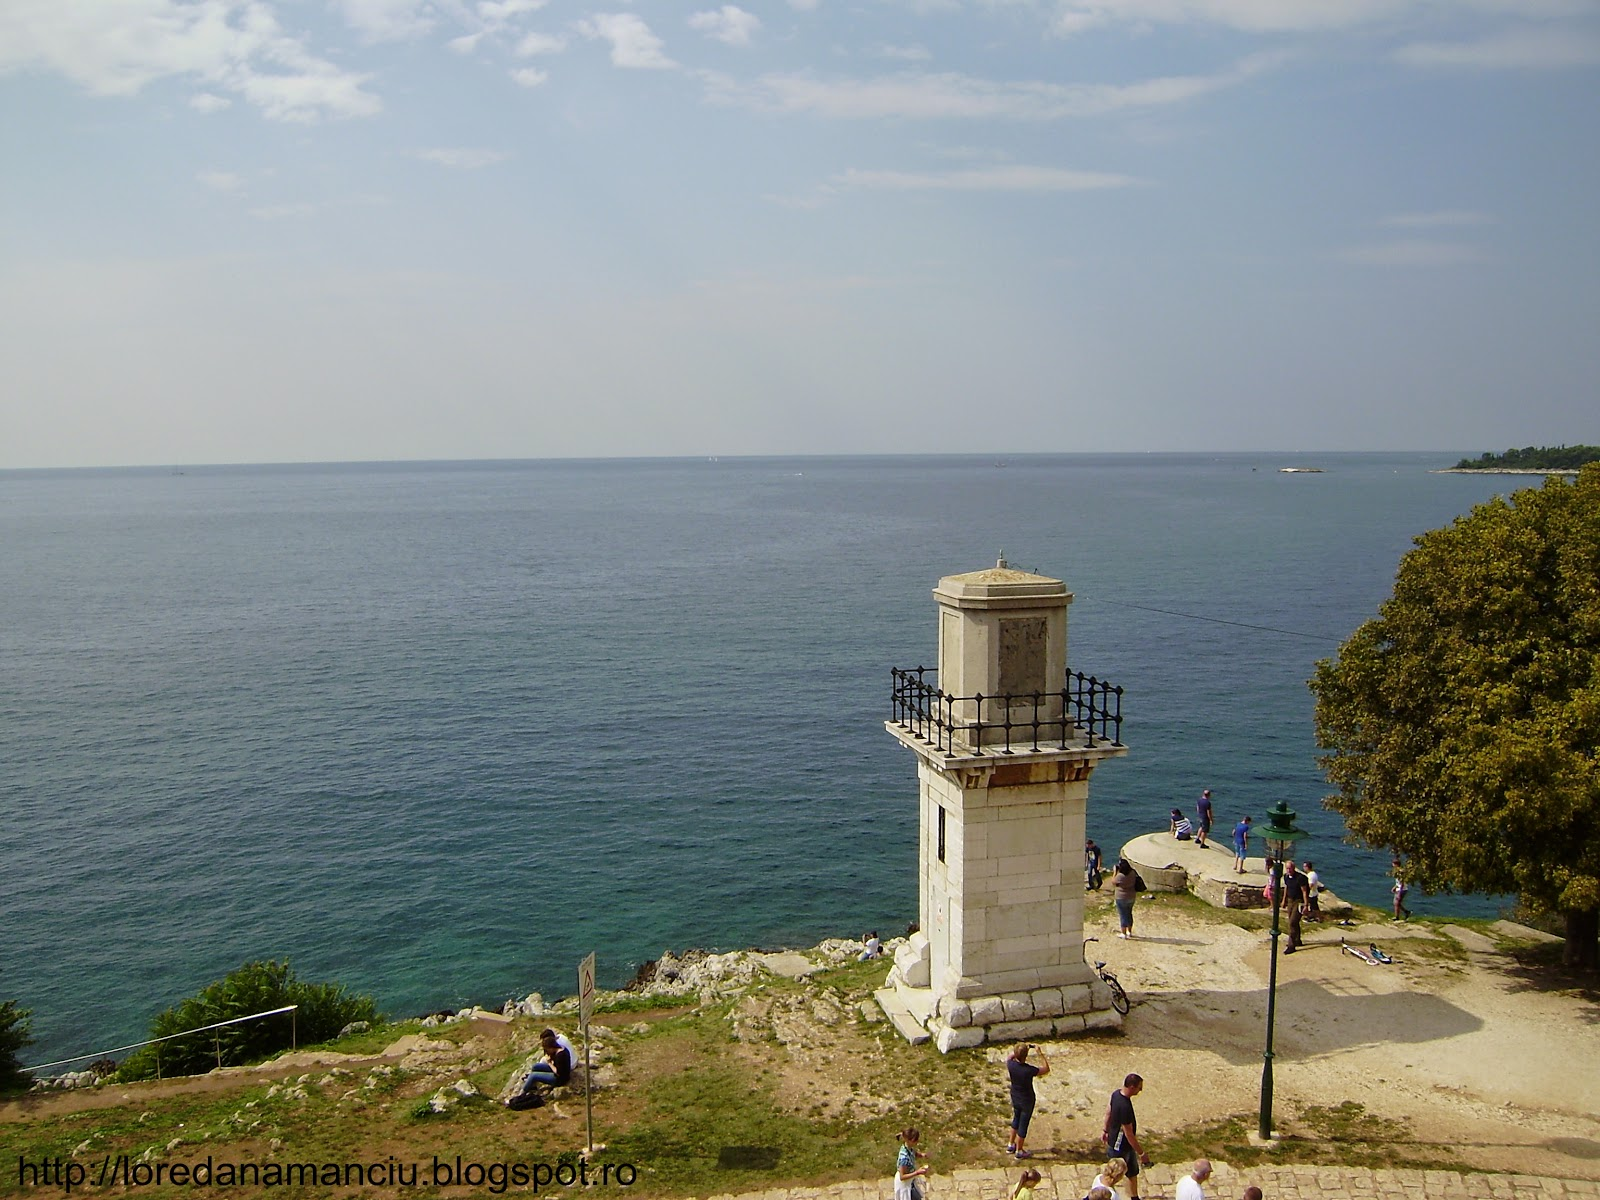 Croatia, orasul port Ronvinji